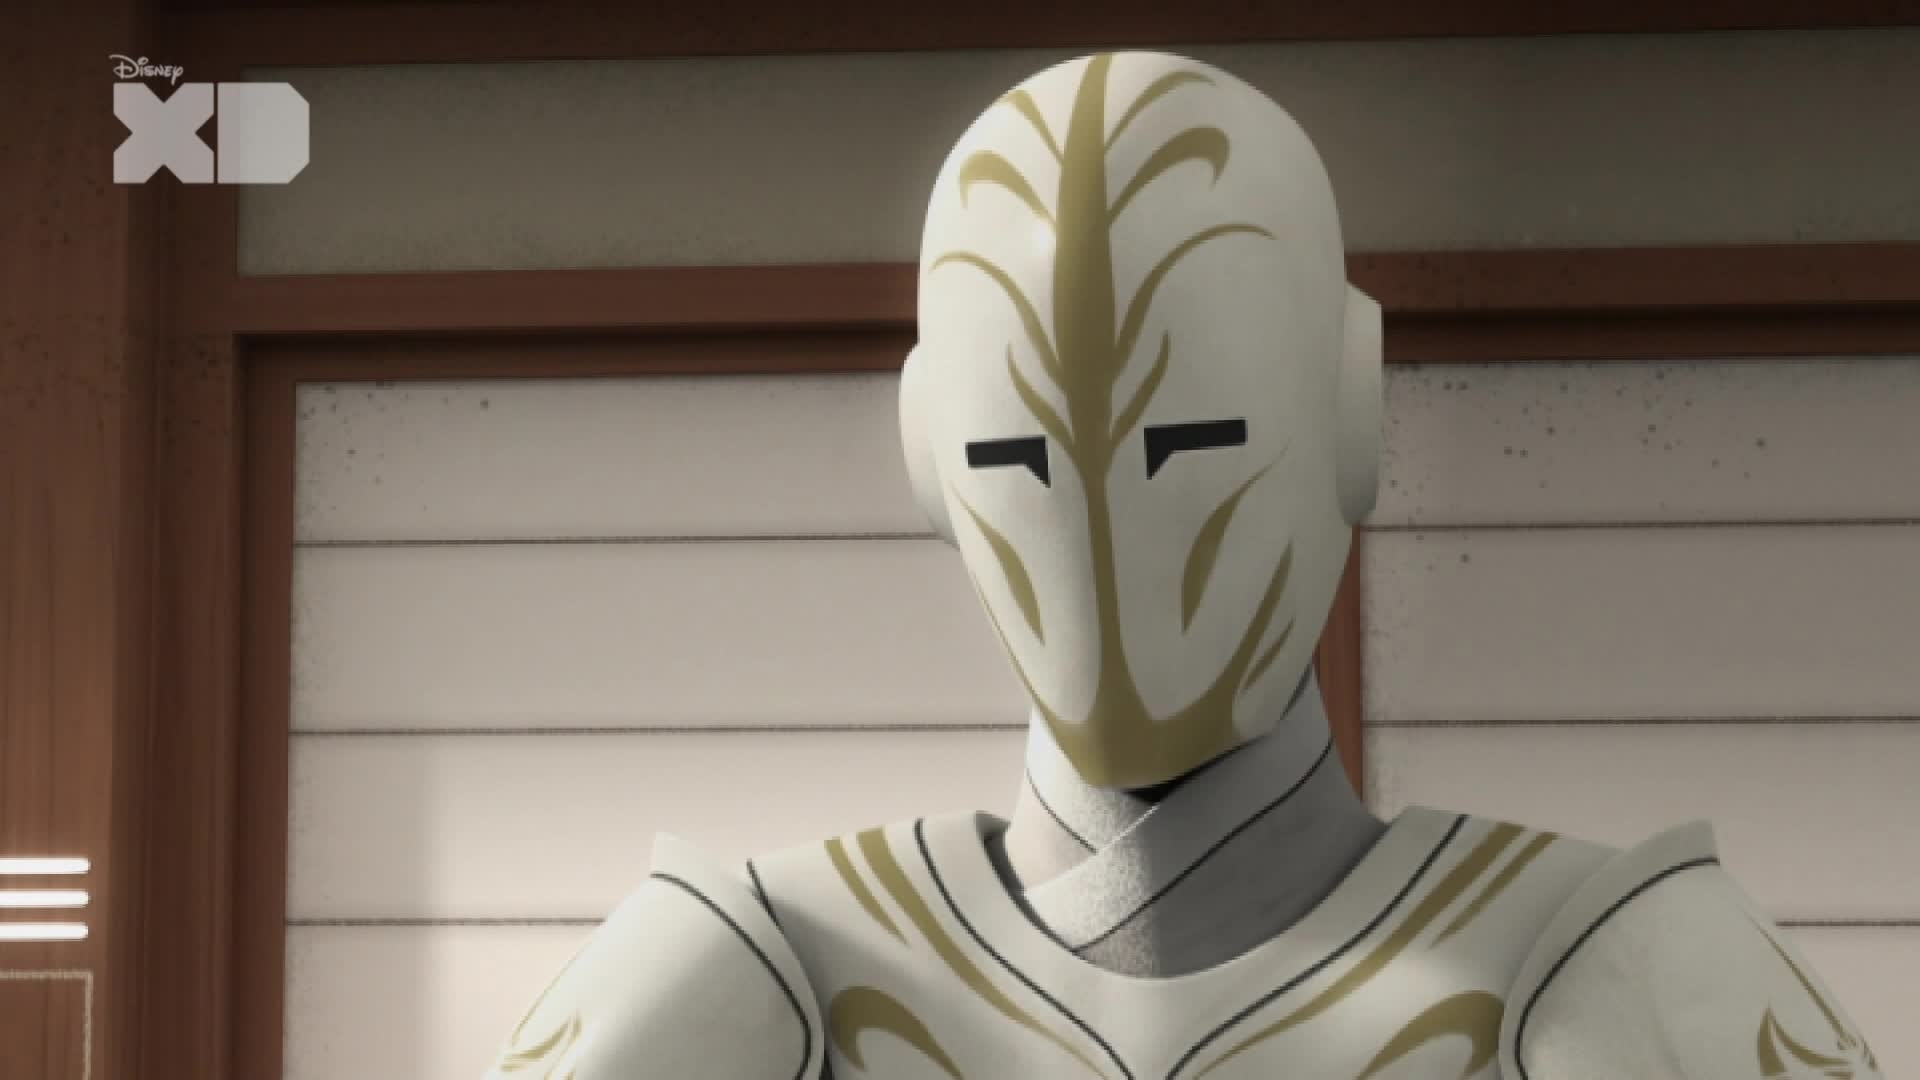 Shroud of Darkness - Star Wars Rebels - ZA